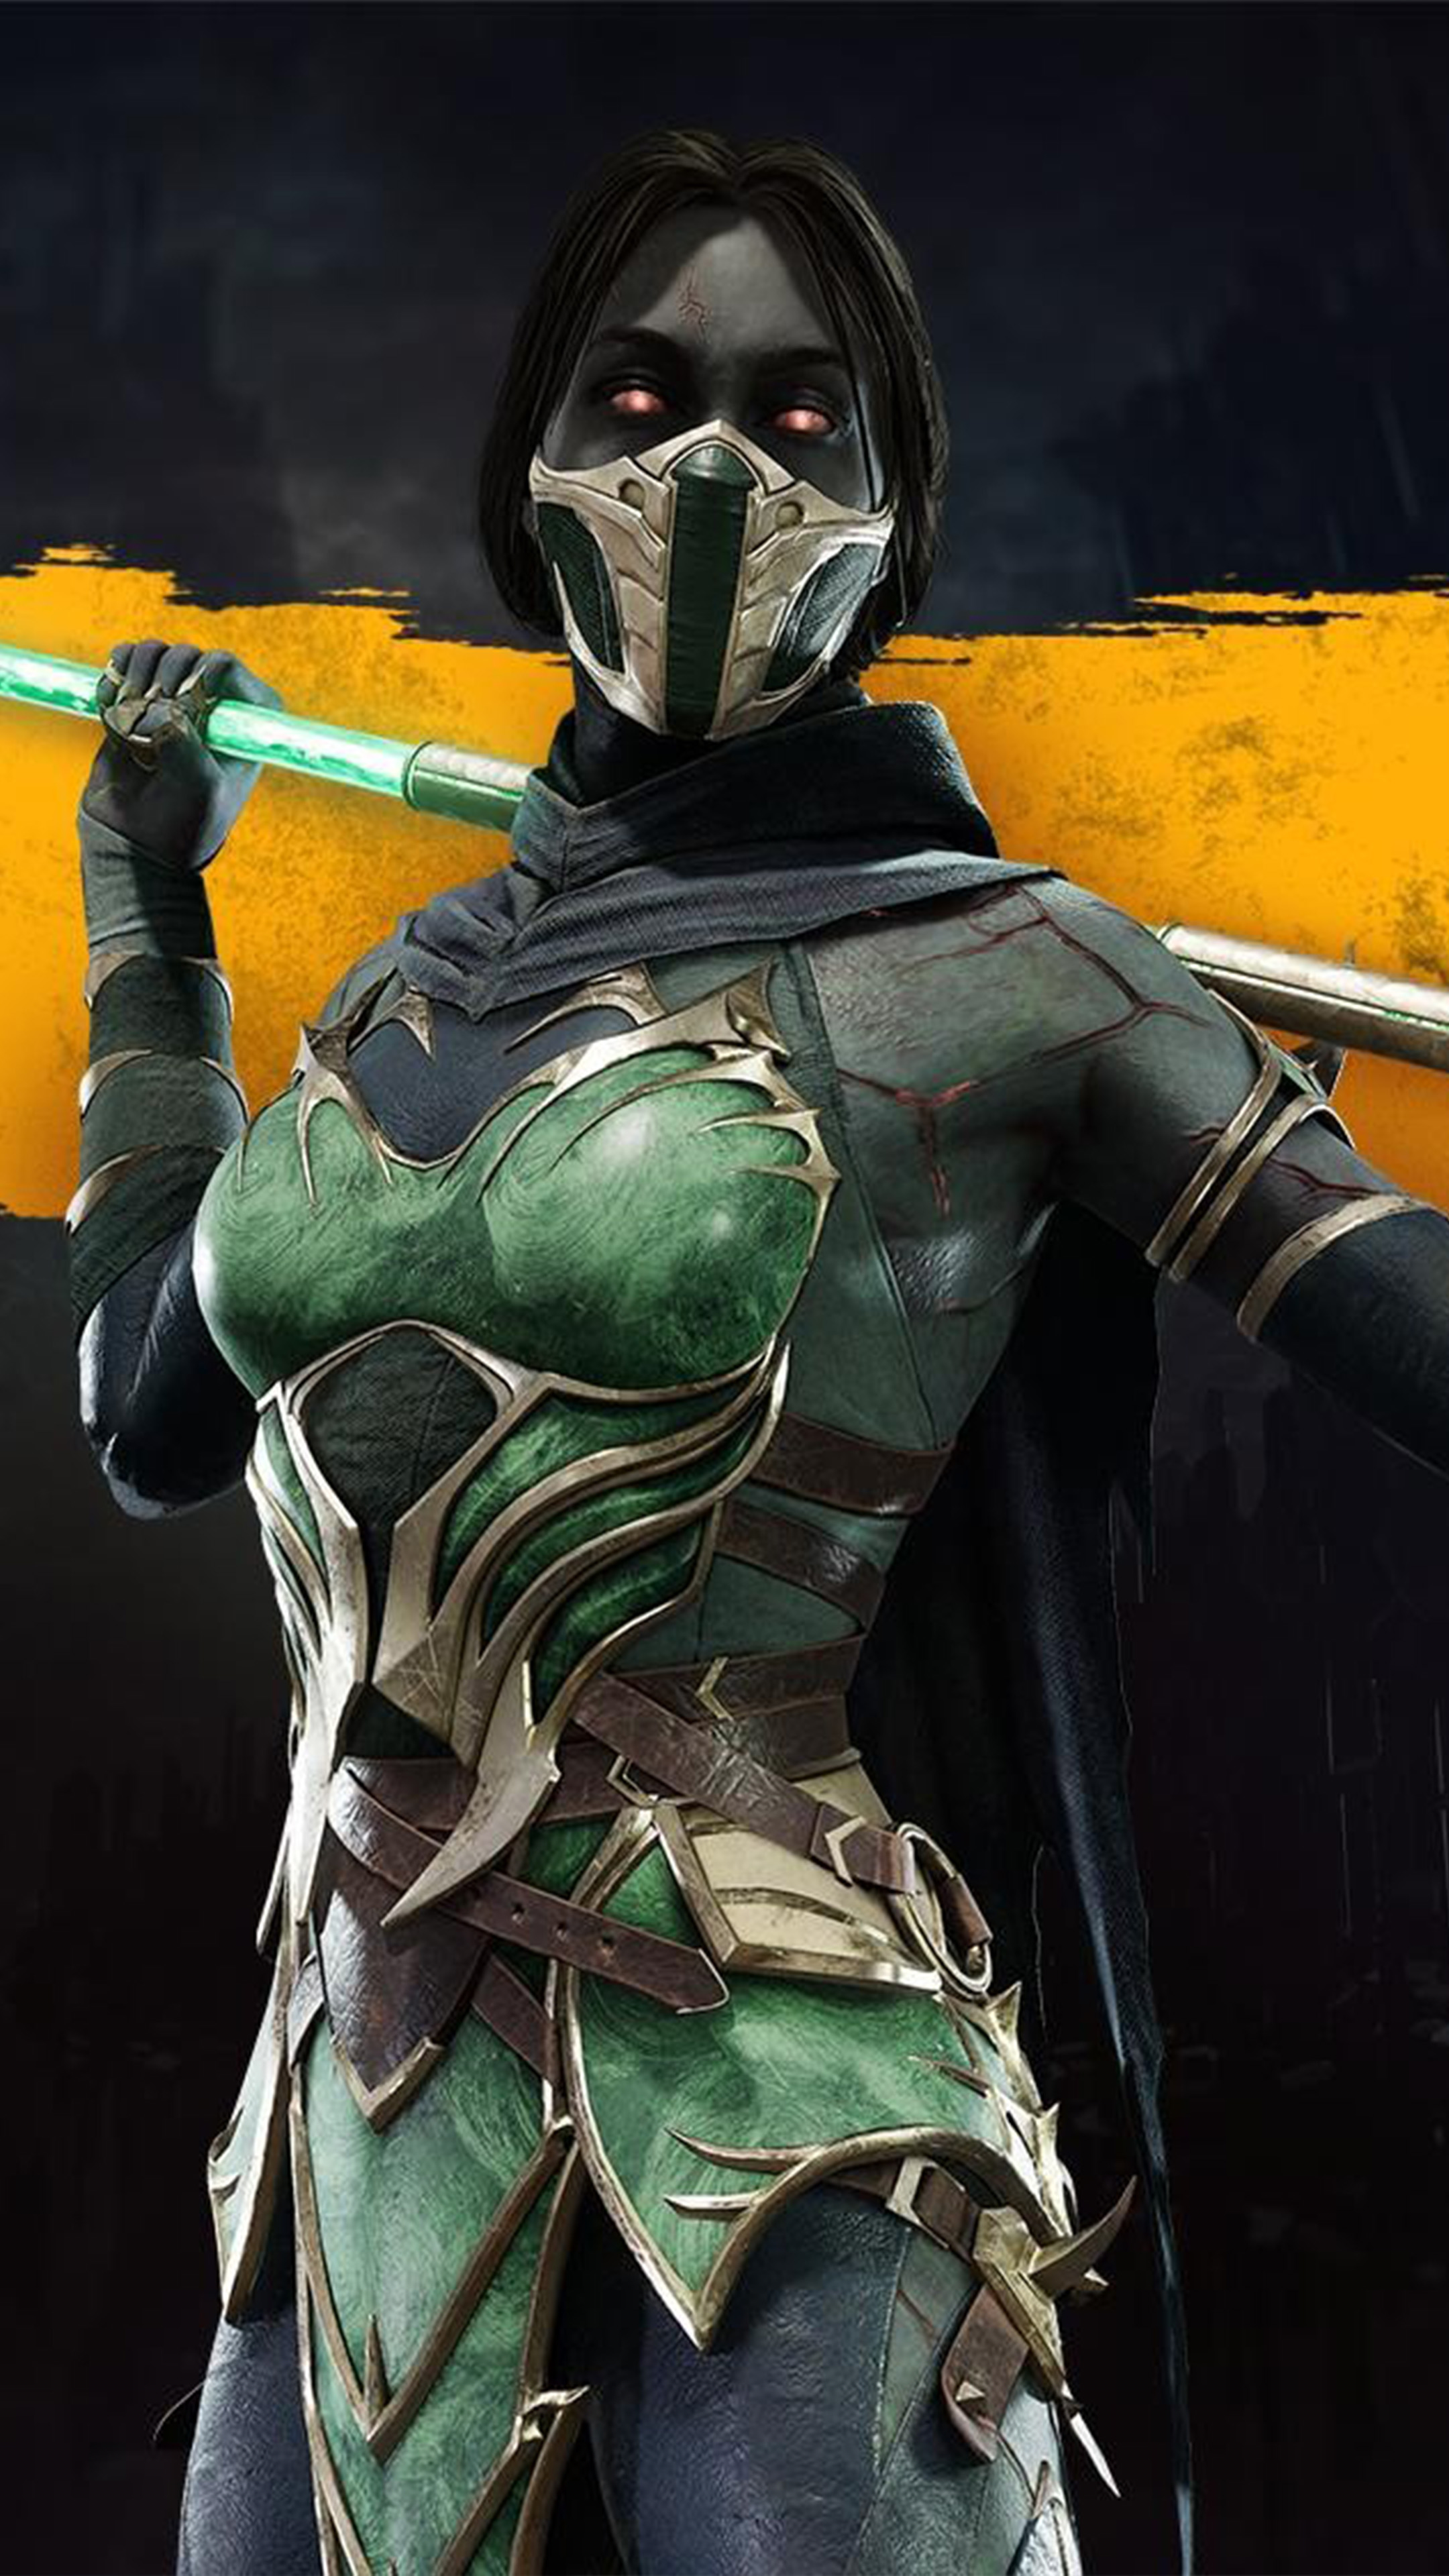 Jade Mortal Kombat 11 Free 4k Ultra Hd Mobile Wallpaper